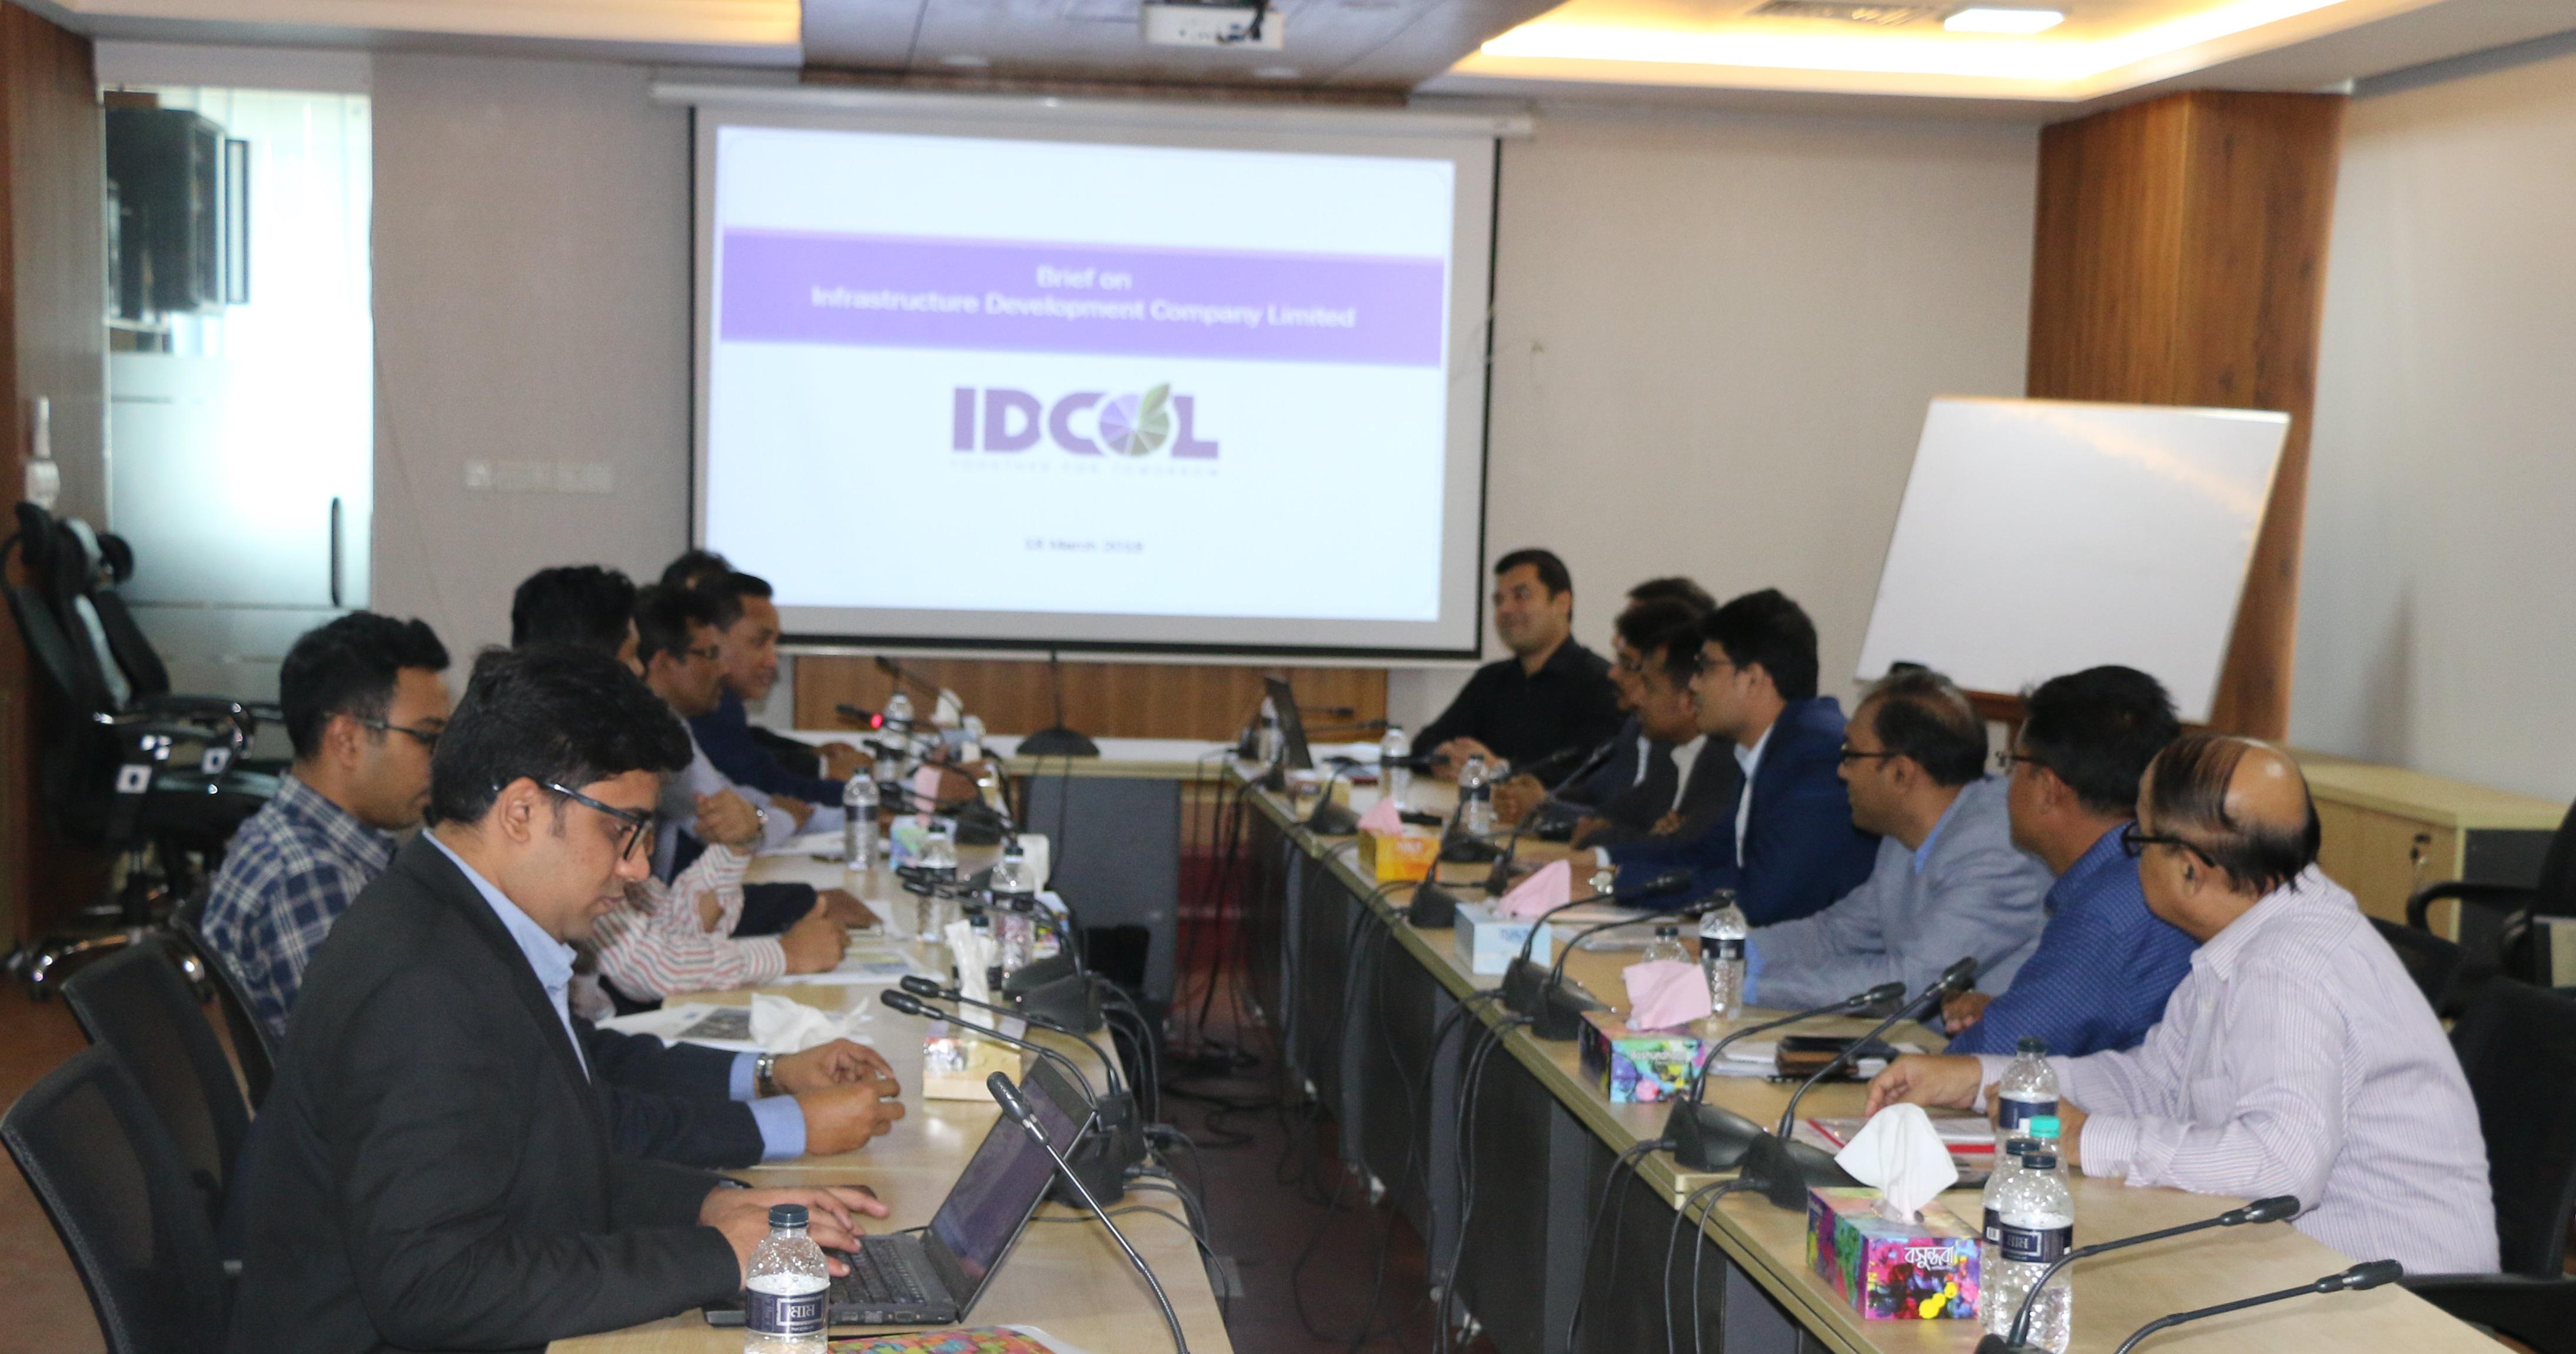 Infrastructure Development Company Limited (IDCOL)